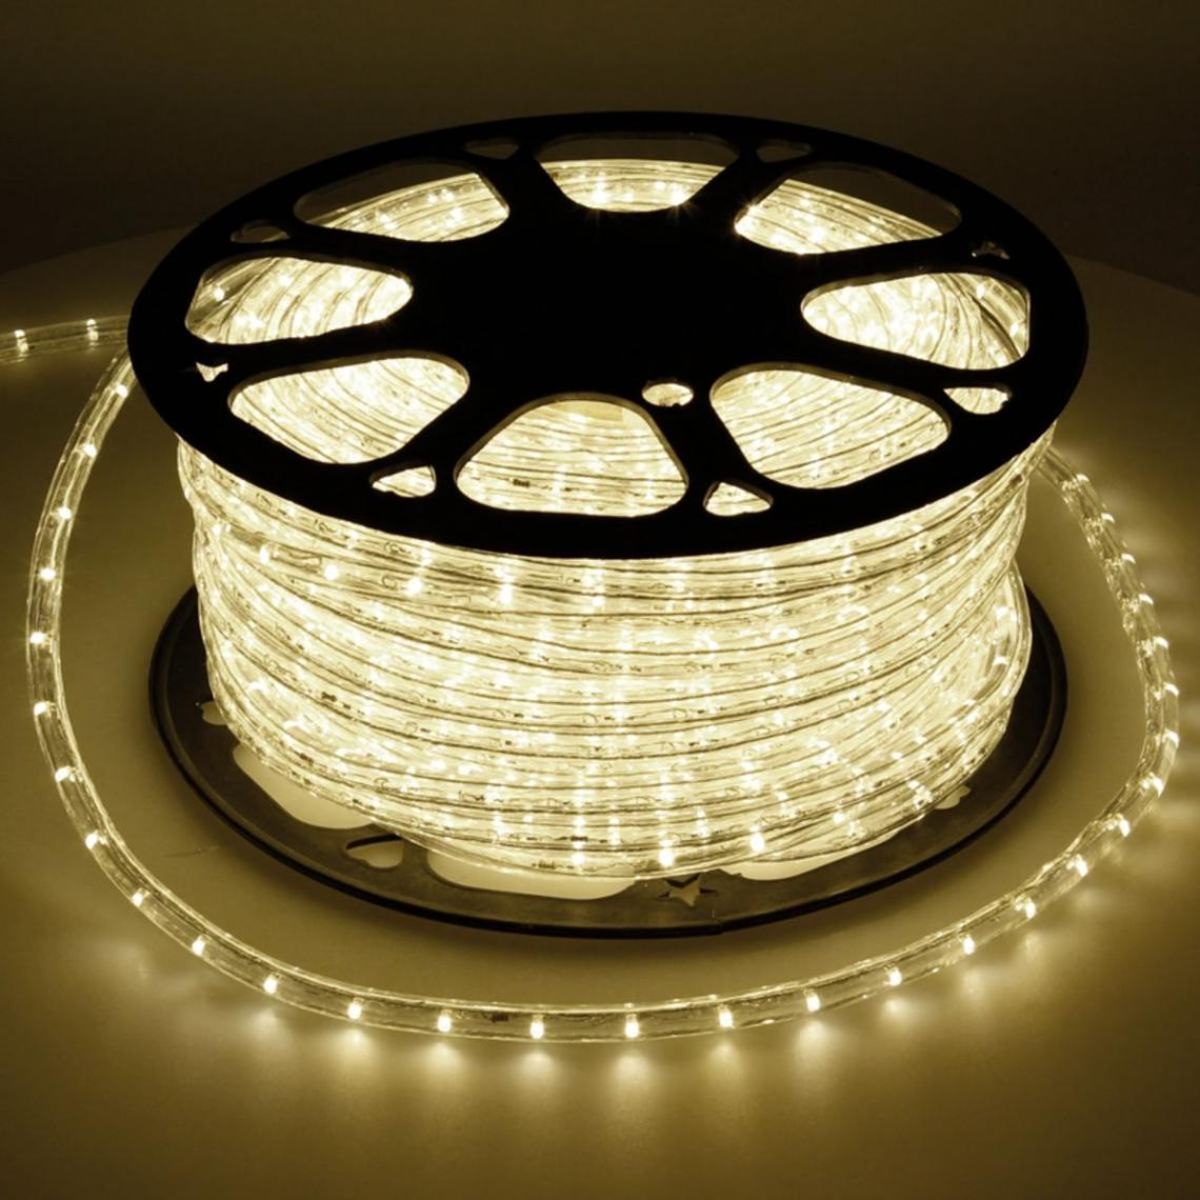 Ecd Germany ECD Germany LED Tube Lumière Guirlande 30m - 12W CA - 220-240V - Blanc chaud 3000K - 791 Lumens - Bandes de LED de Noël